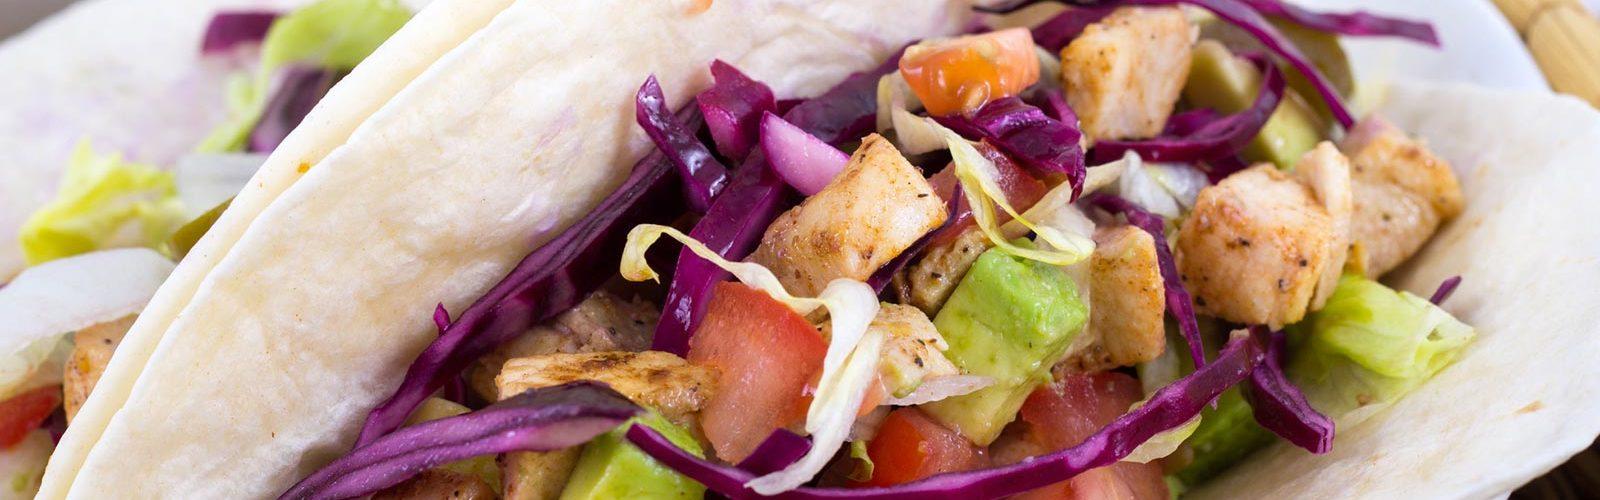 fish-taco-san-diego-recette-une